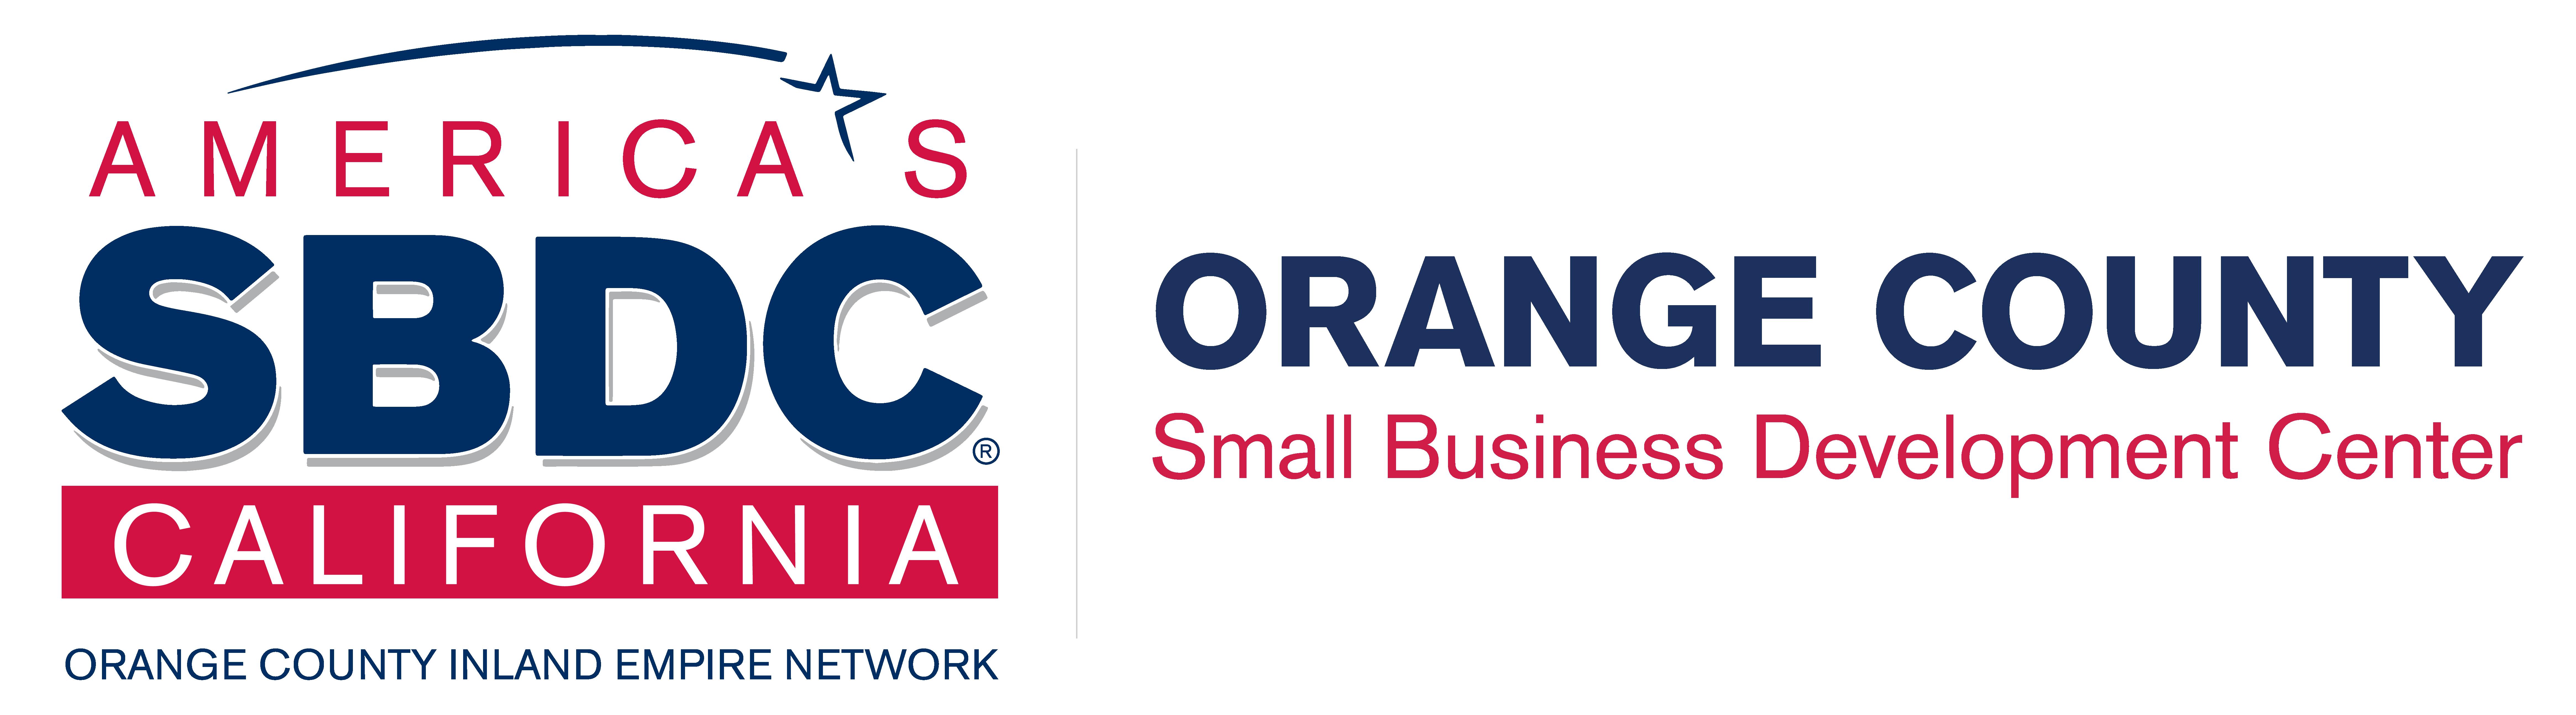 Orange County Small Business Development Center Ocsbdc